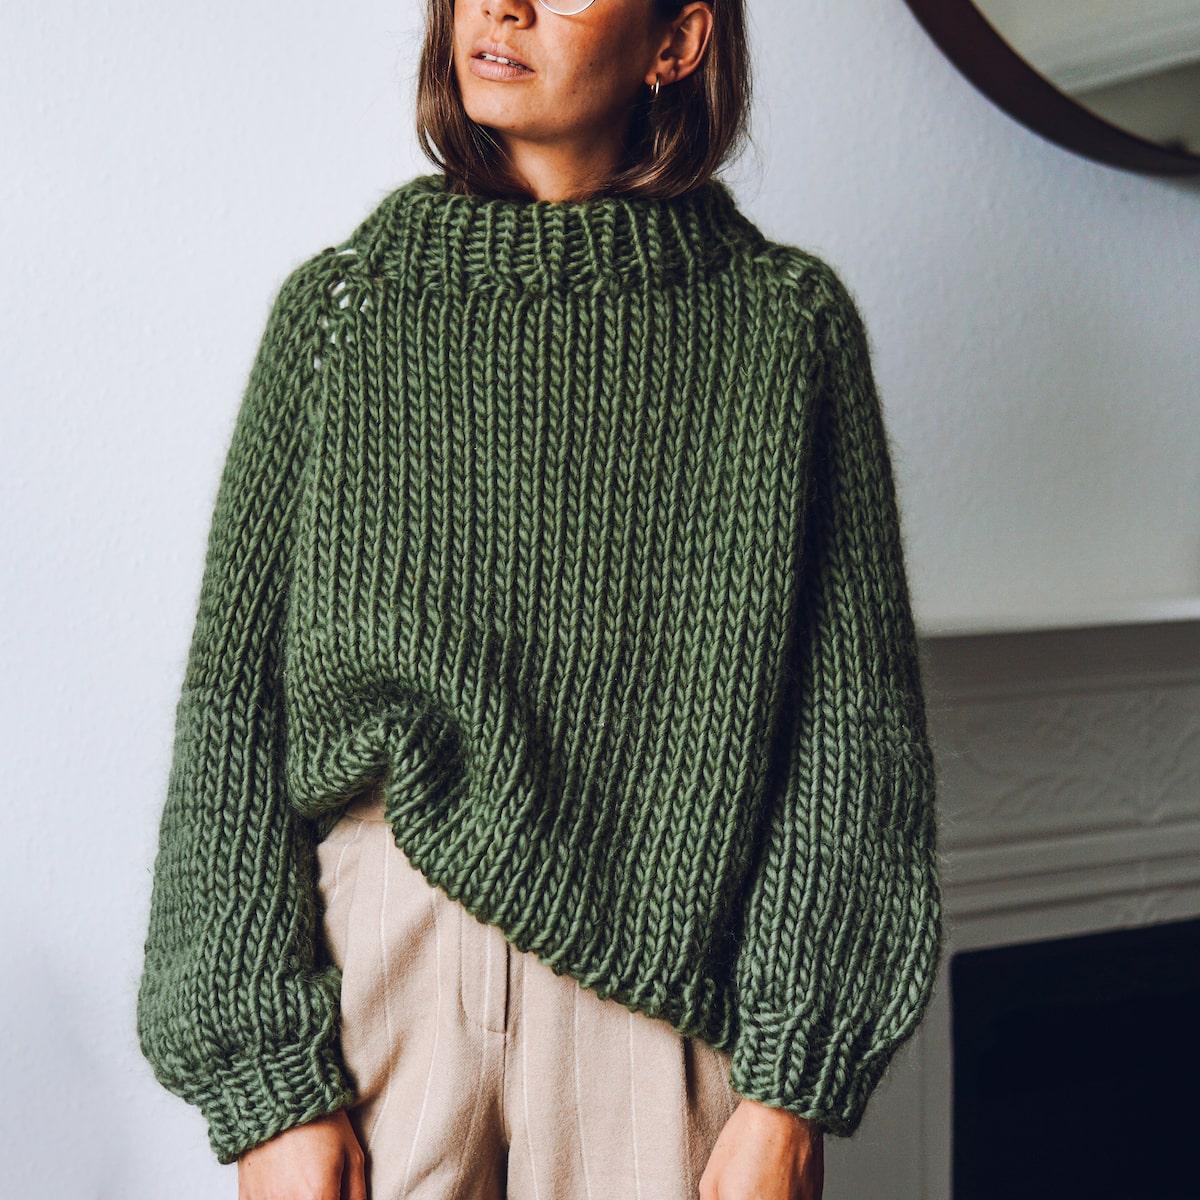 Roll up Knit down Jumper - Knitting Pattern - Lauren Aston ...